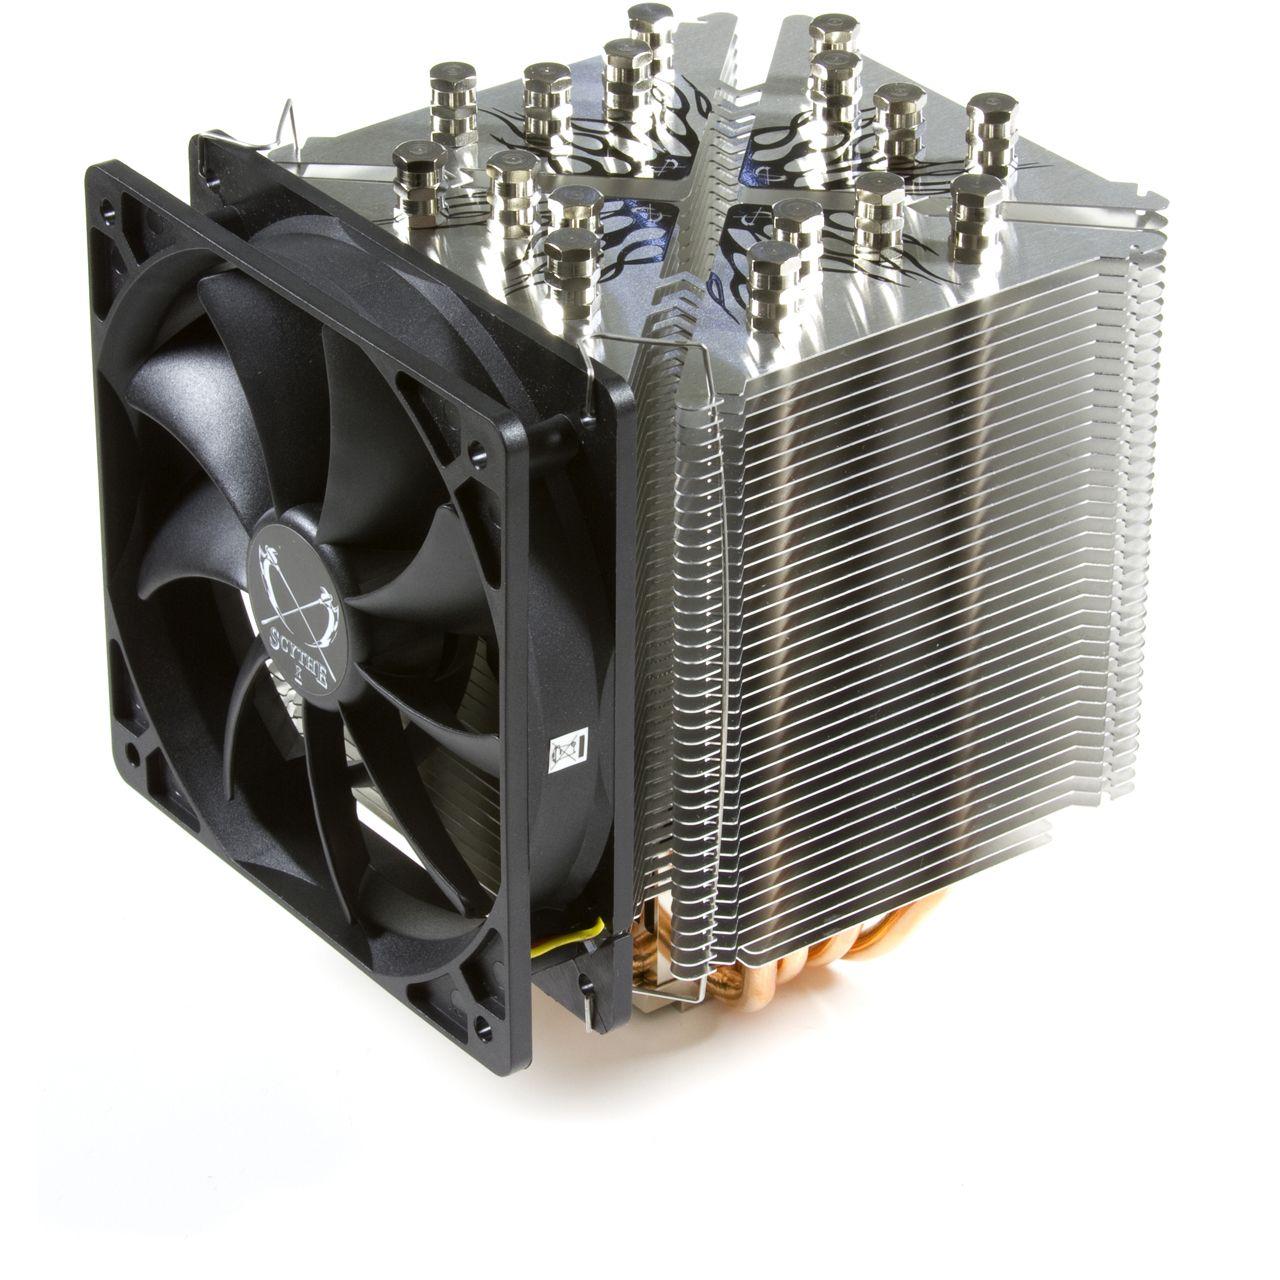 Scythe SCNJ-3000 Ninja 3 AMD und Intel - CPU Kühler | Mindfactory.de ...